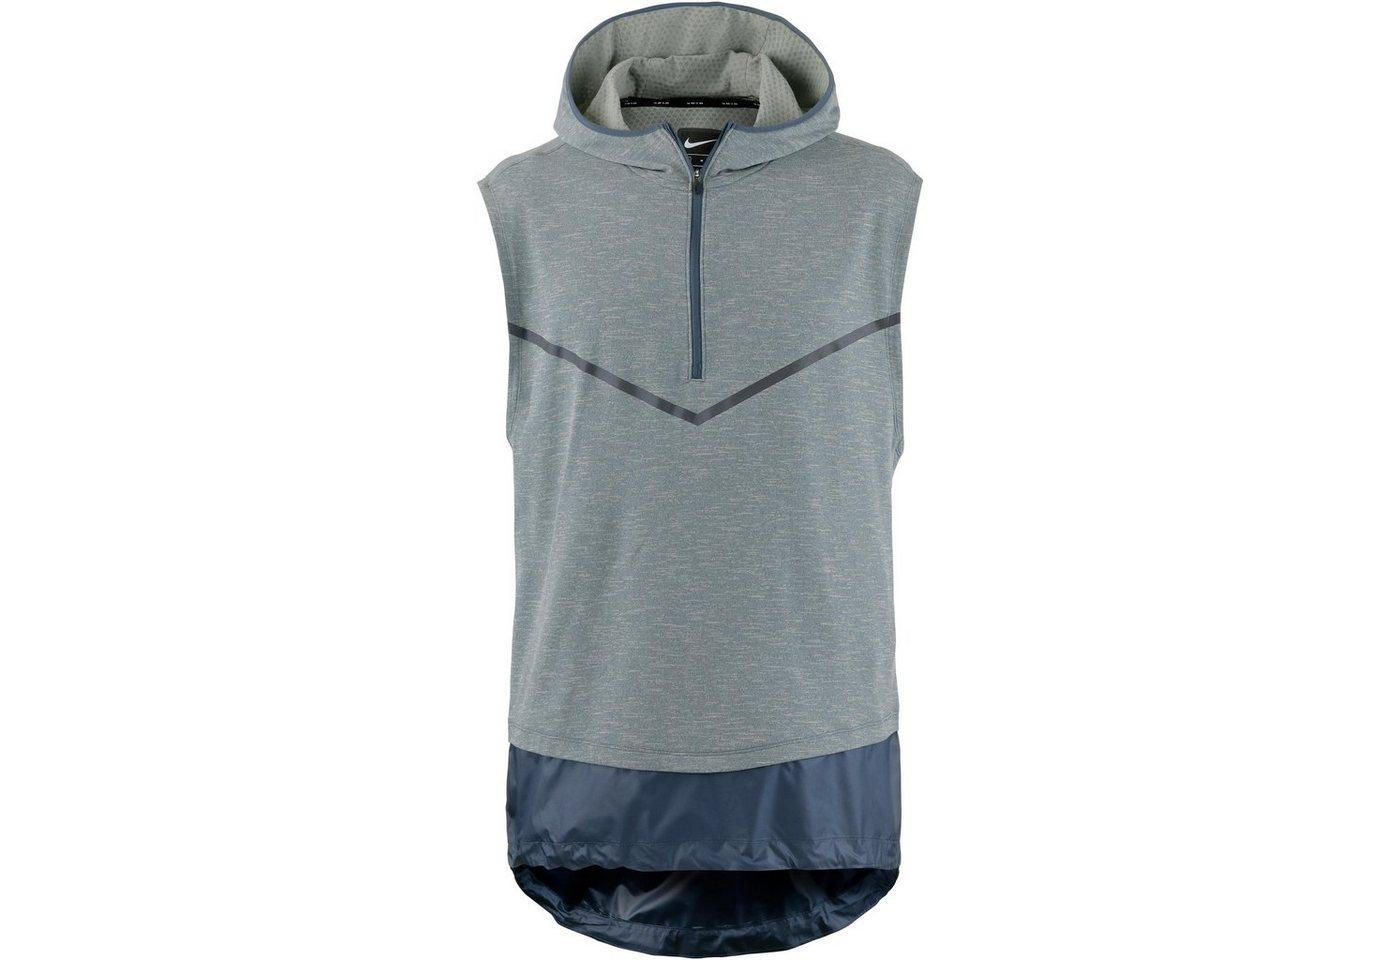 Nike Tanktop »Sphere Tech Pack« | Bekleidung > Shirts > Tank Tops | Blau | Nike